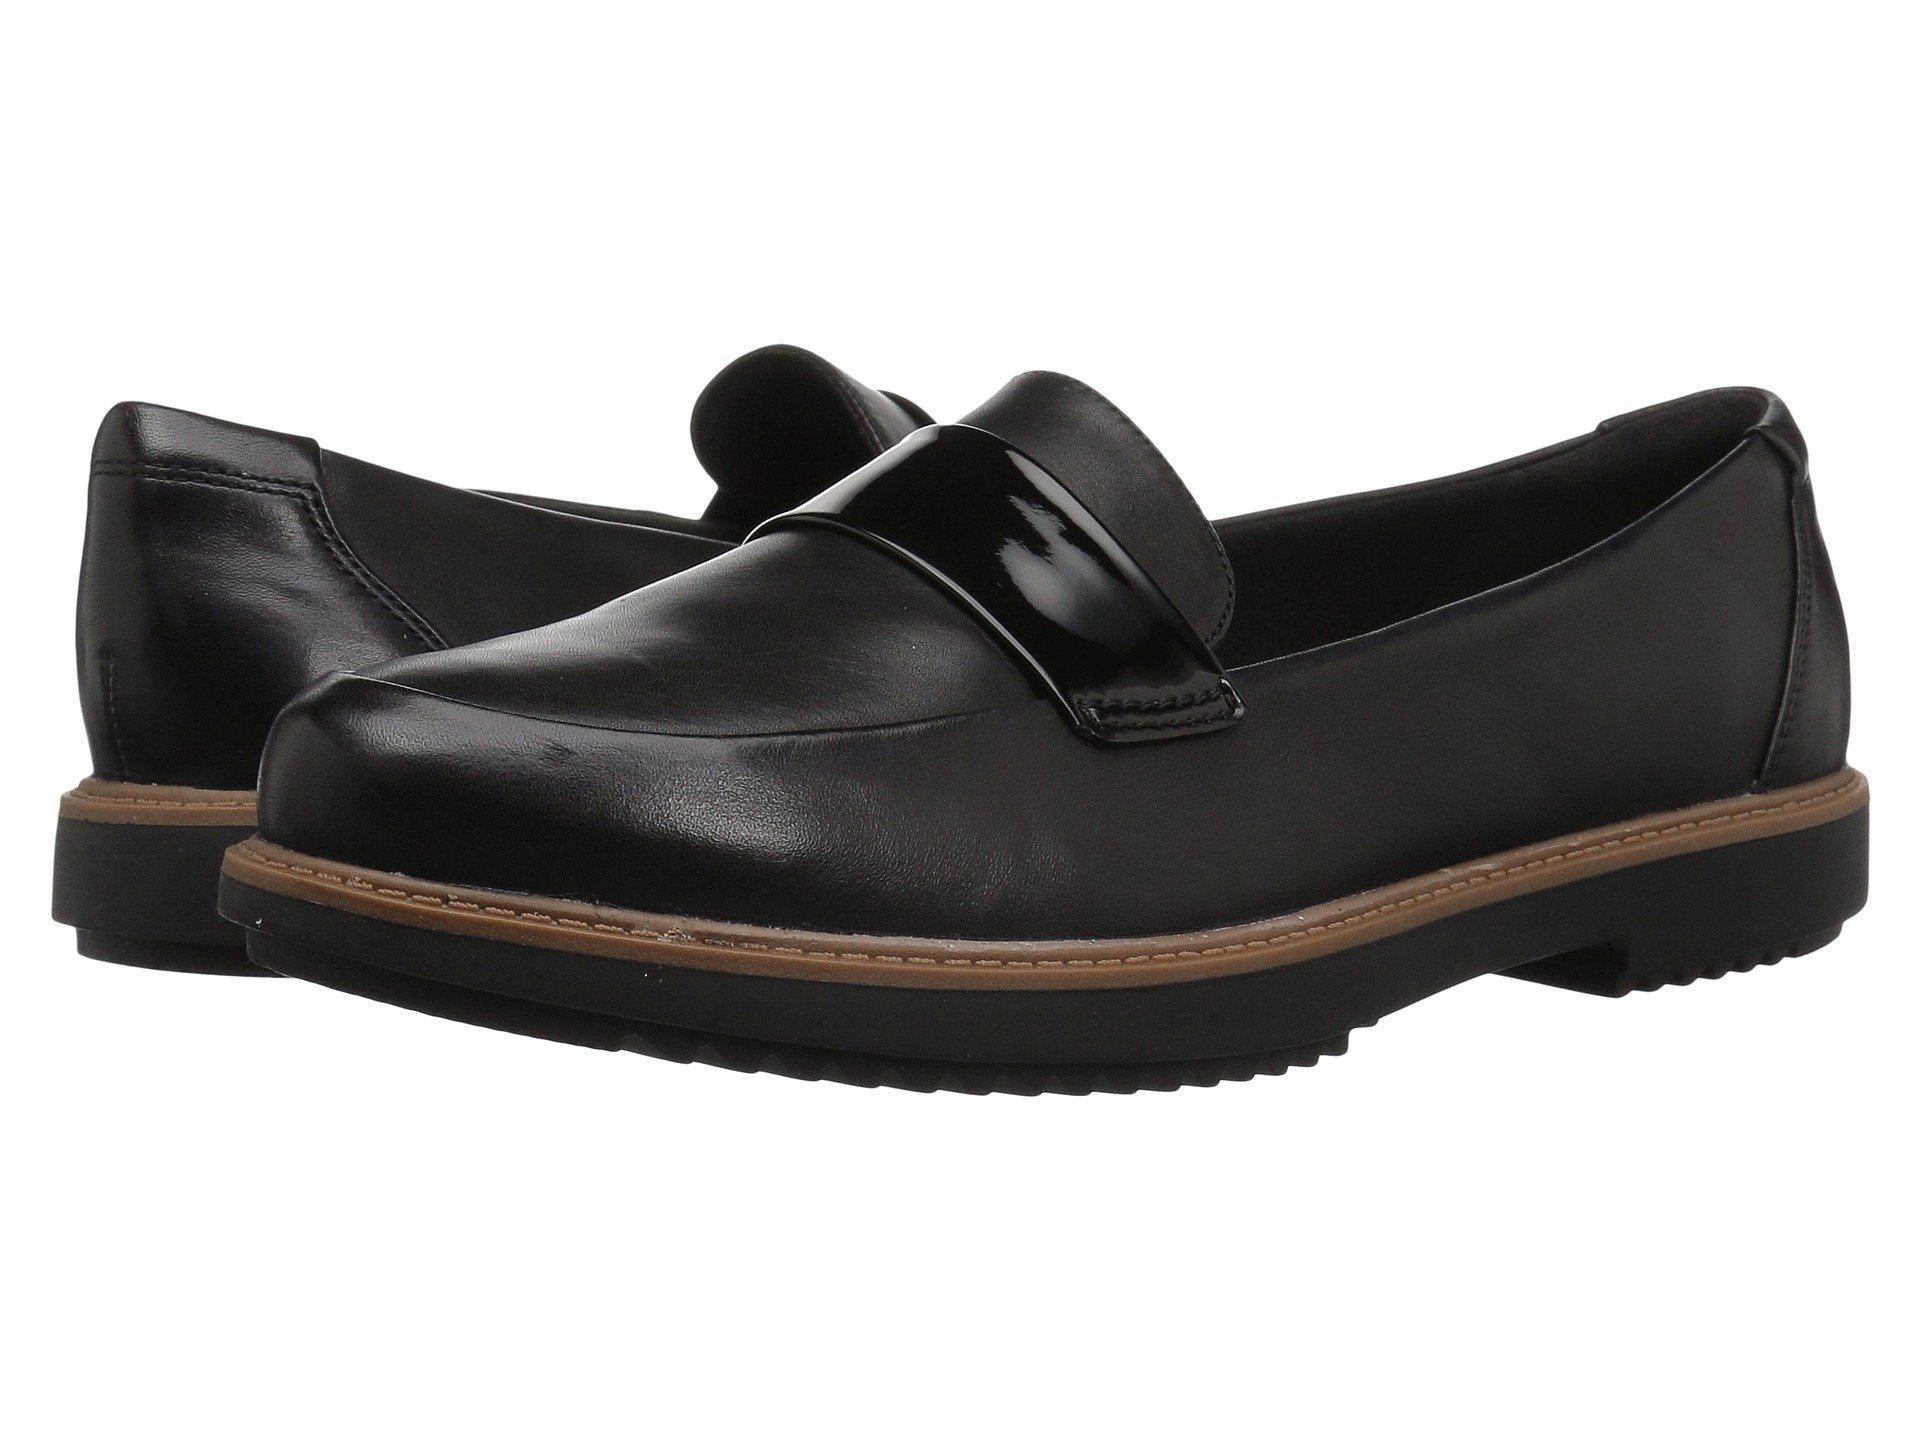 7f293edda10 Clarks - Raisie Arlie (black Leather) Women s Shoes - Lyst. View fullscreen